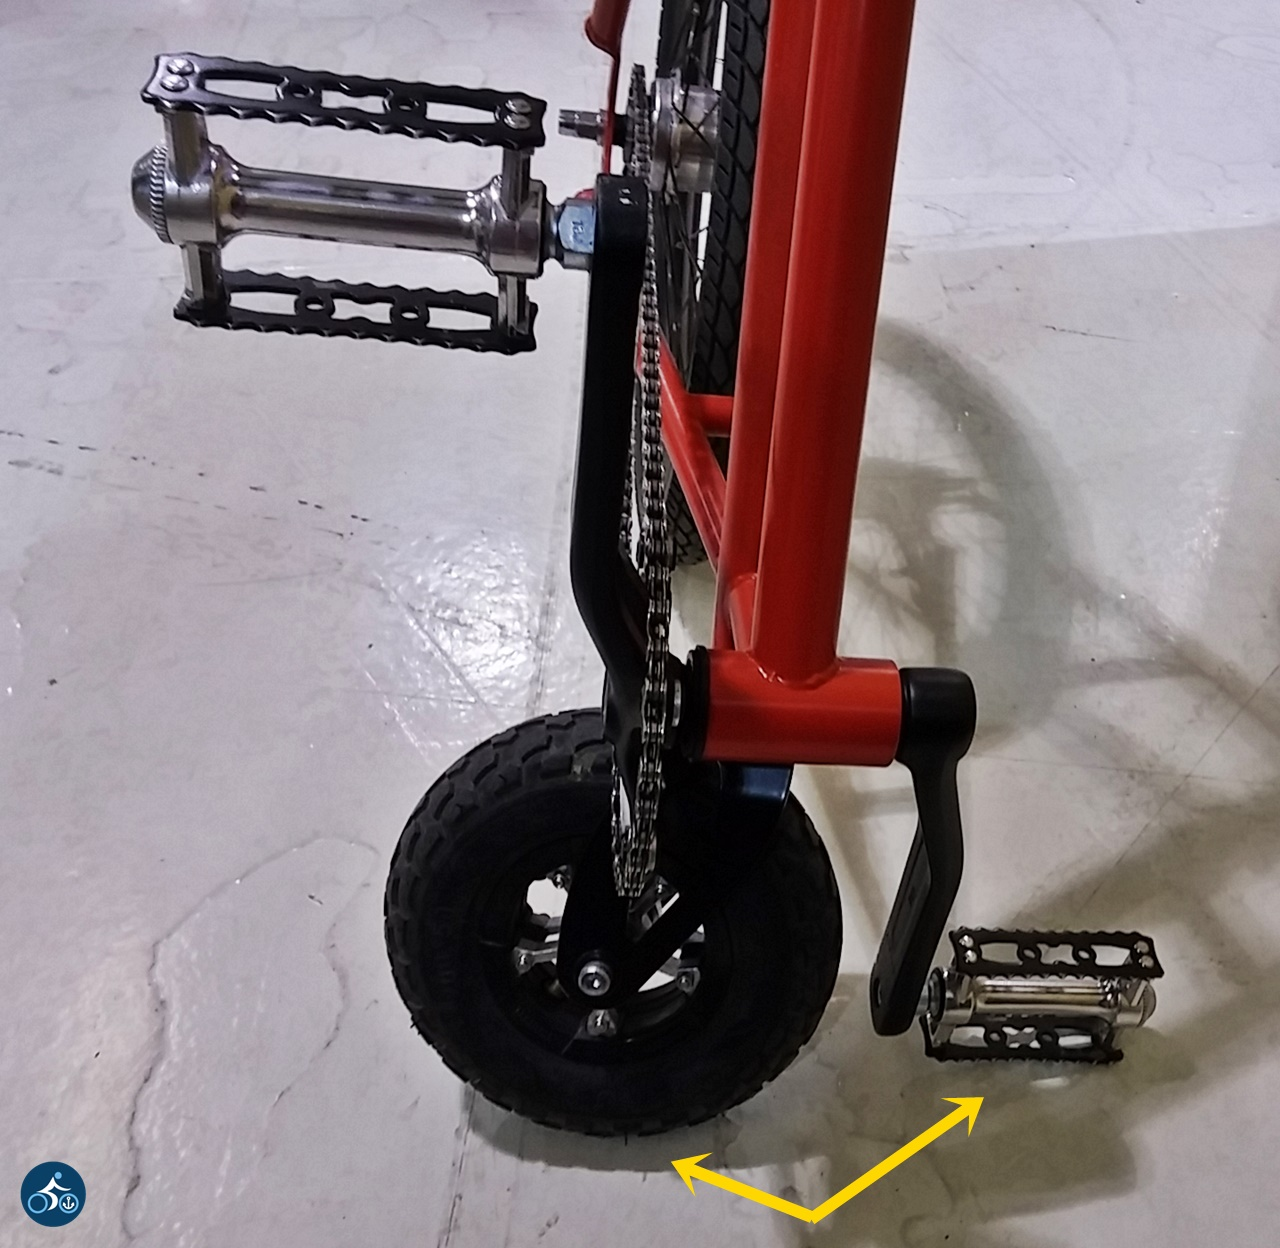 Bewährte Abstellmethode über Vorderrad & Pedal